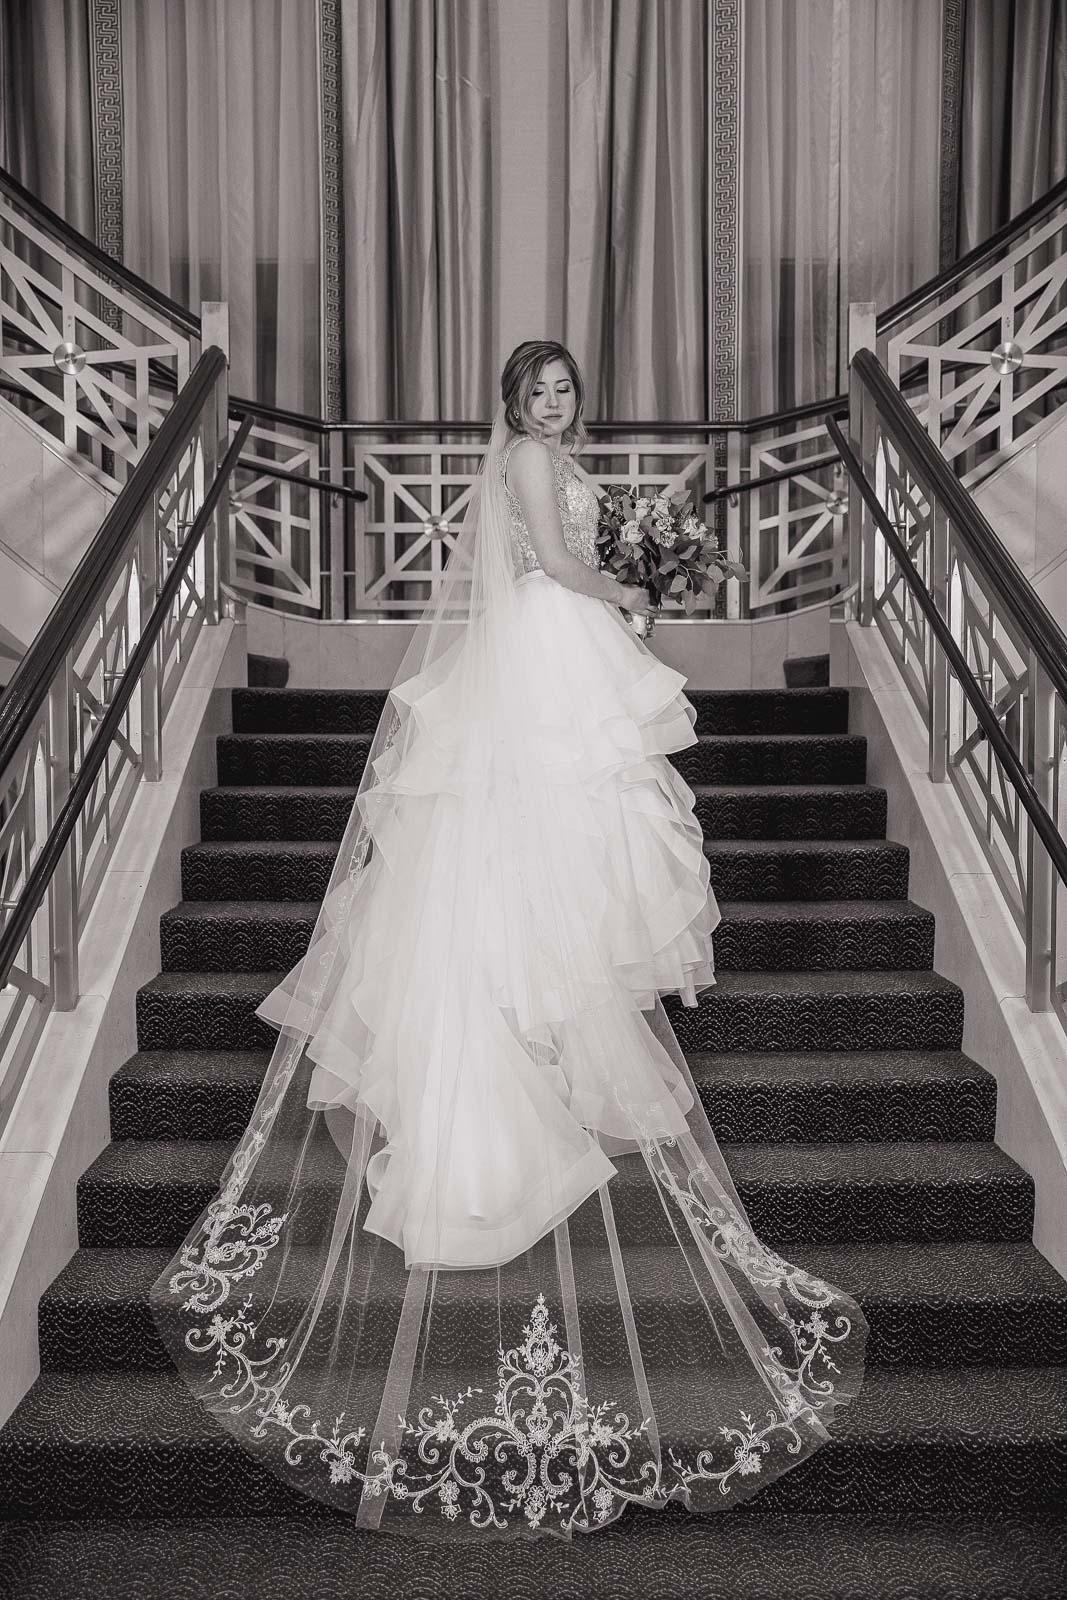 Omni Hotel Providence, Omni, Providence, Rhode Island, RI, Wedding, city wedding, November wedding, Tracy Jenkins Photography, RI wedding photographer, Rhode Island Wedding photographer, bridal portrait